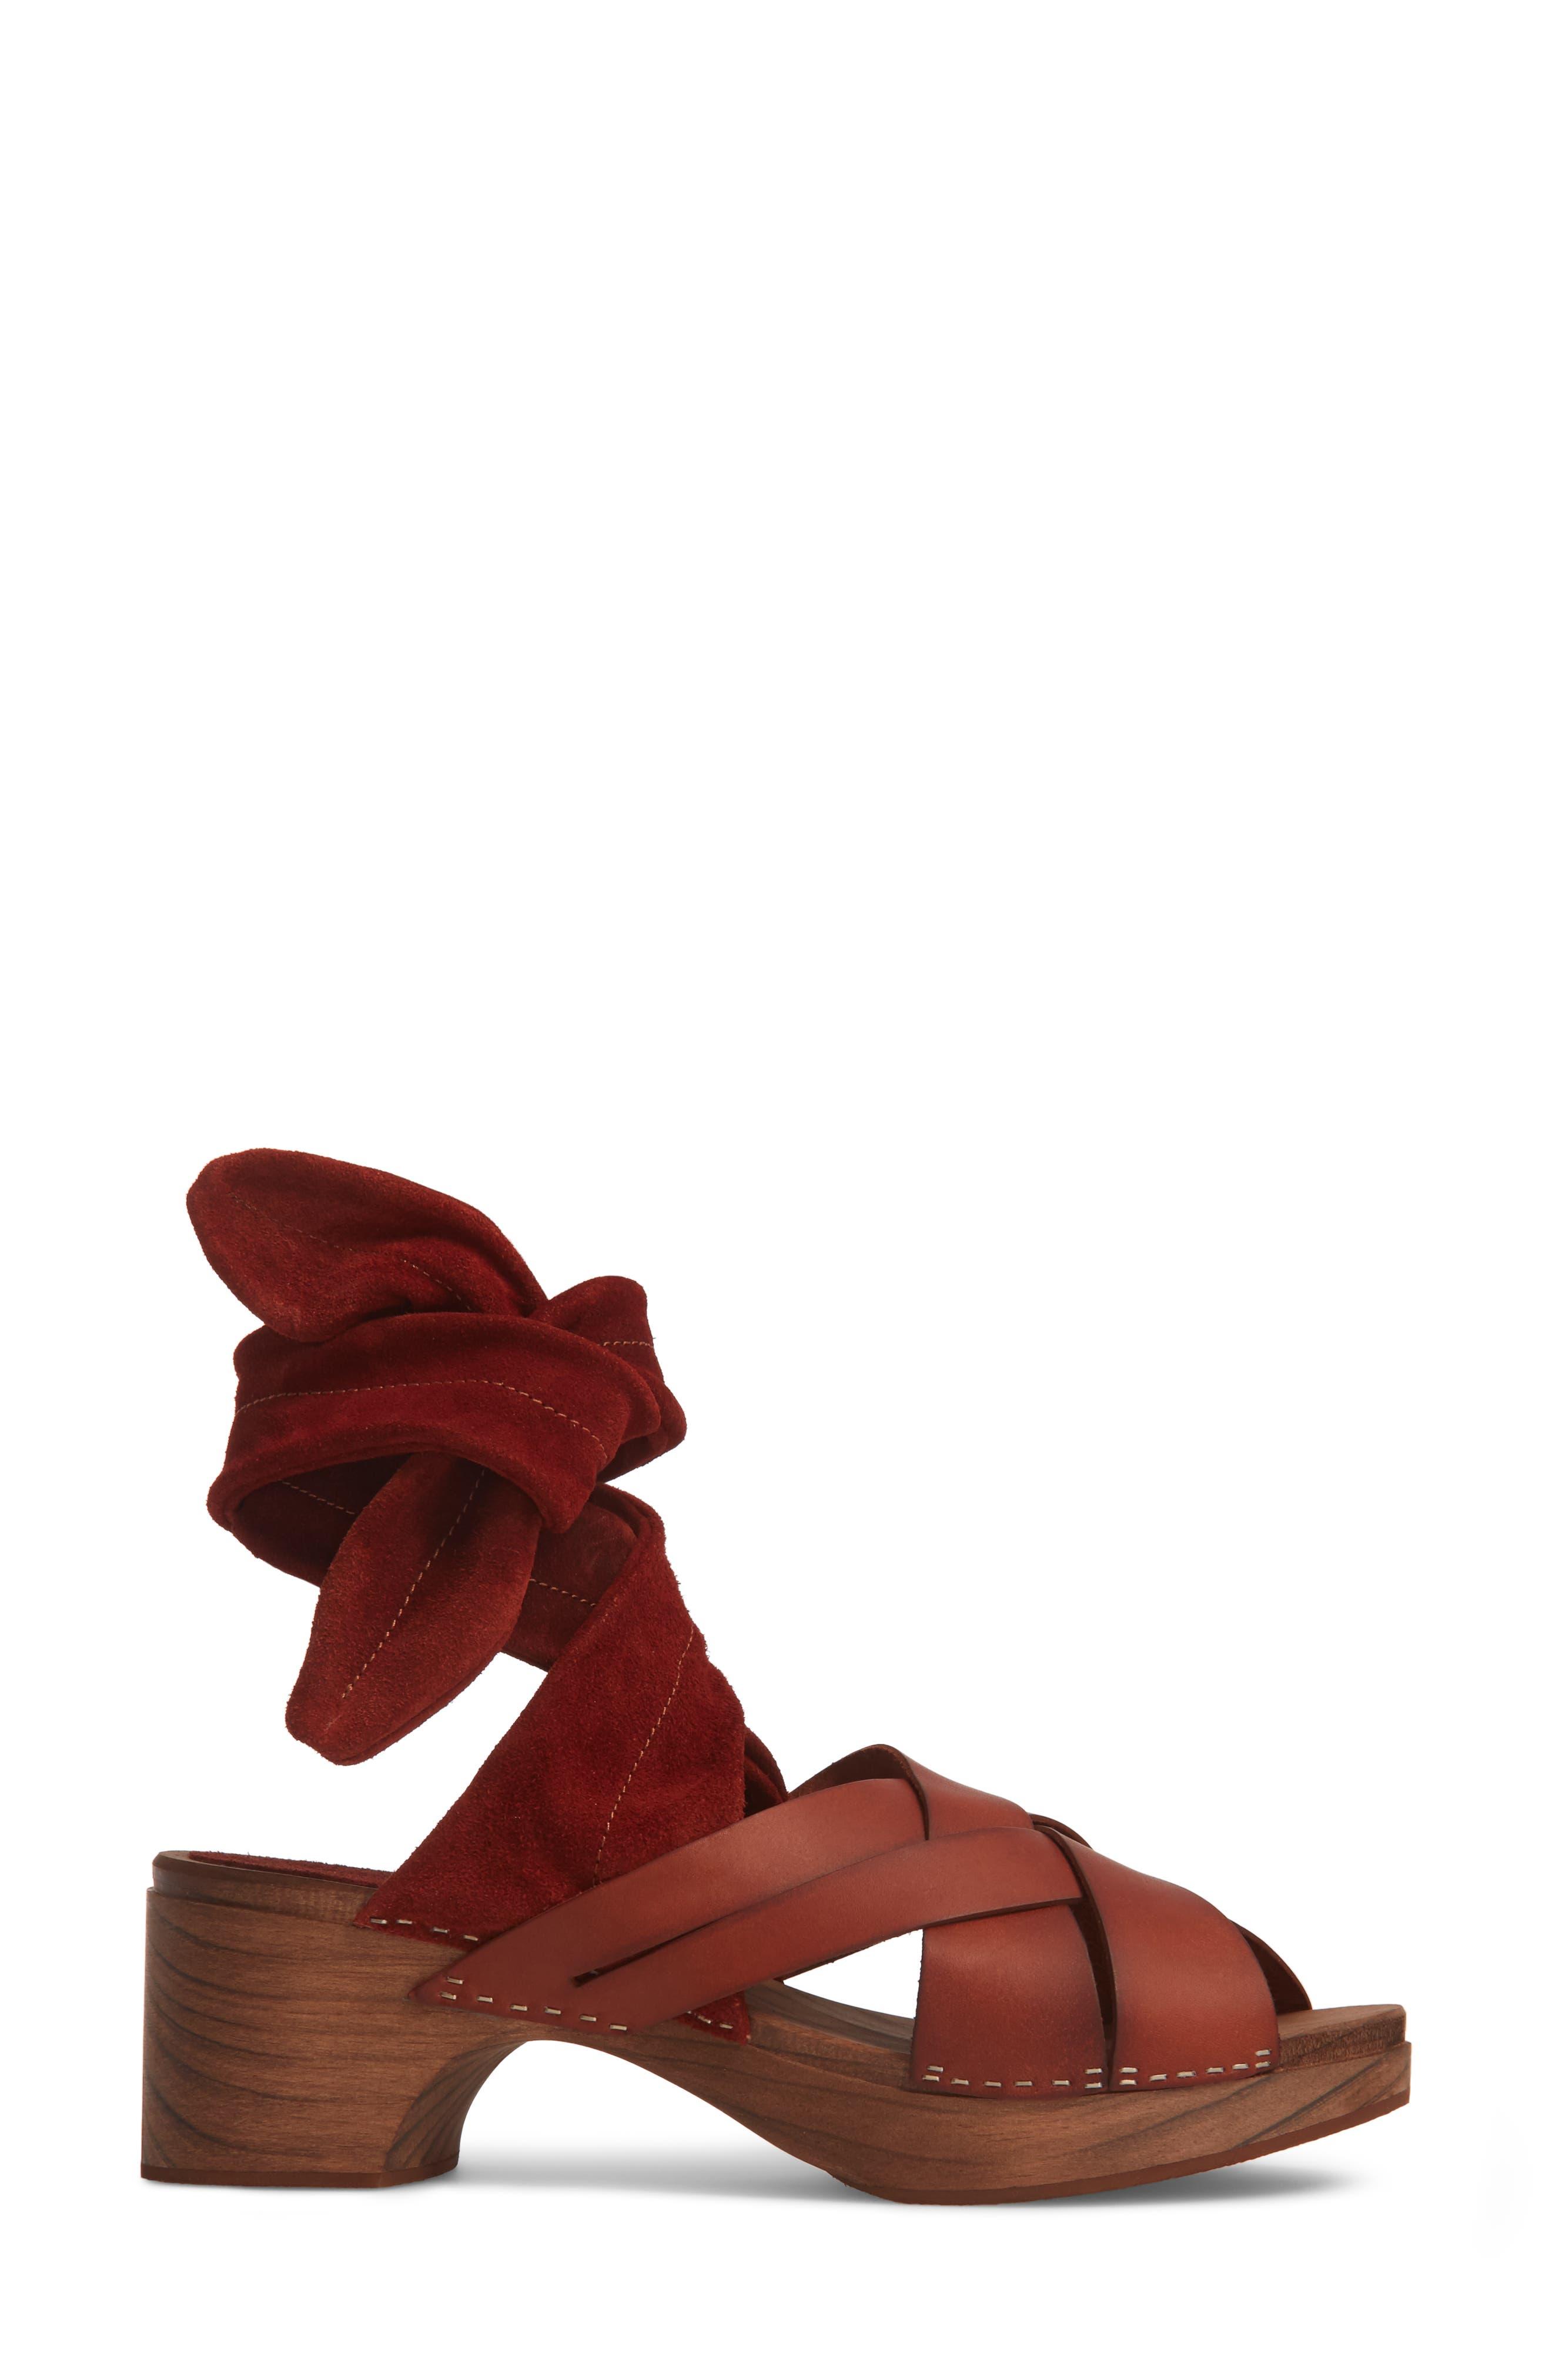 Emmy Ankle Wrap Sandal,                             Alternate thumbnail 3, color,                             Brown